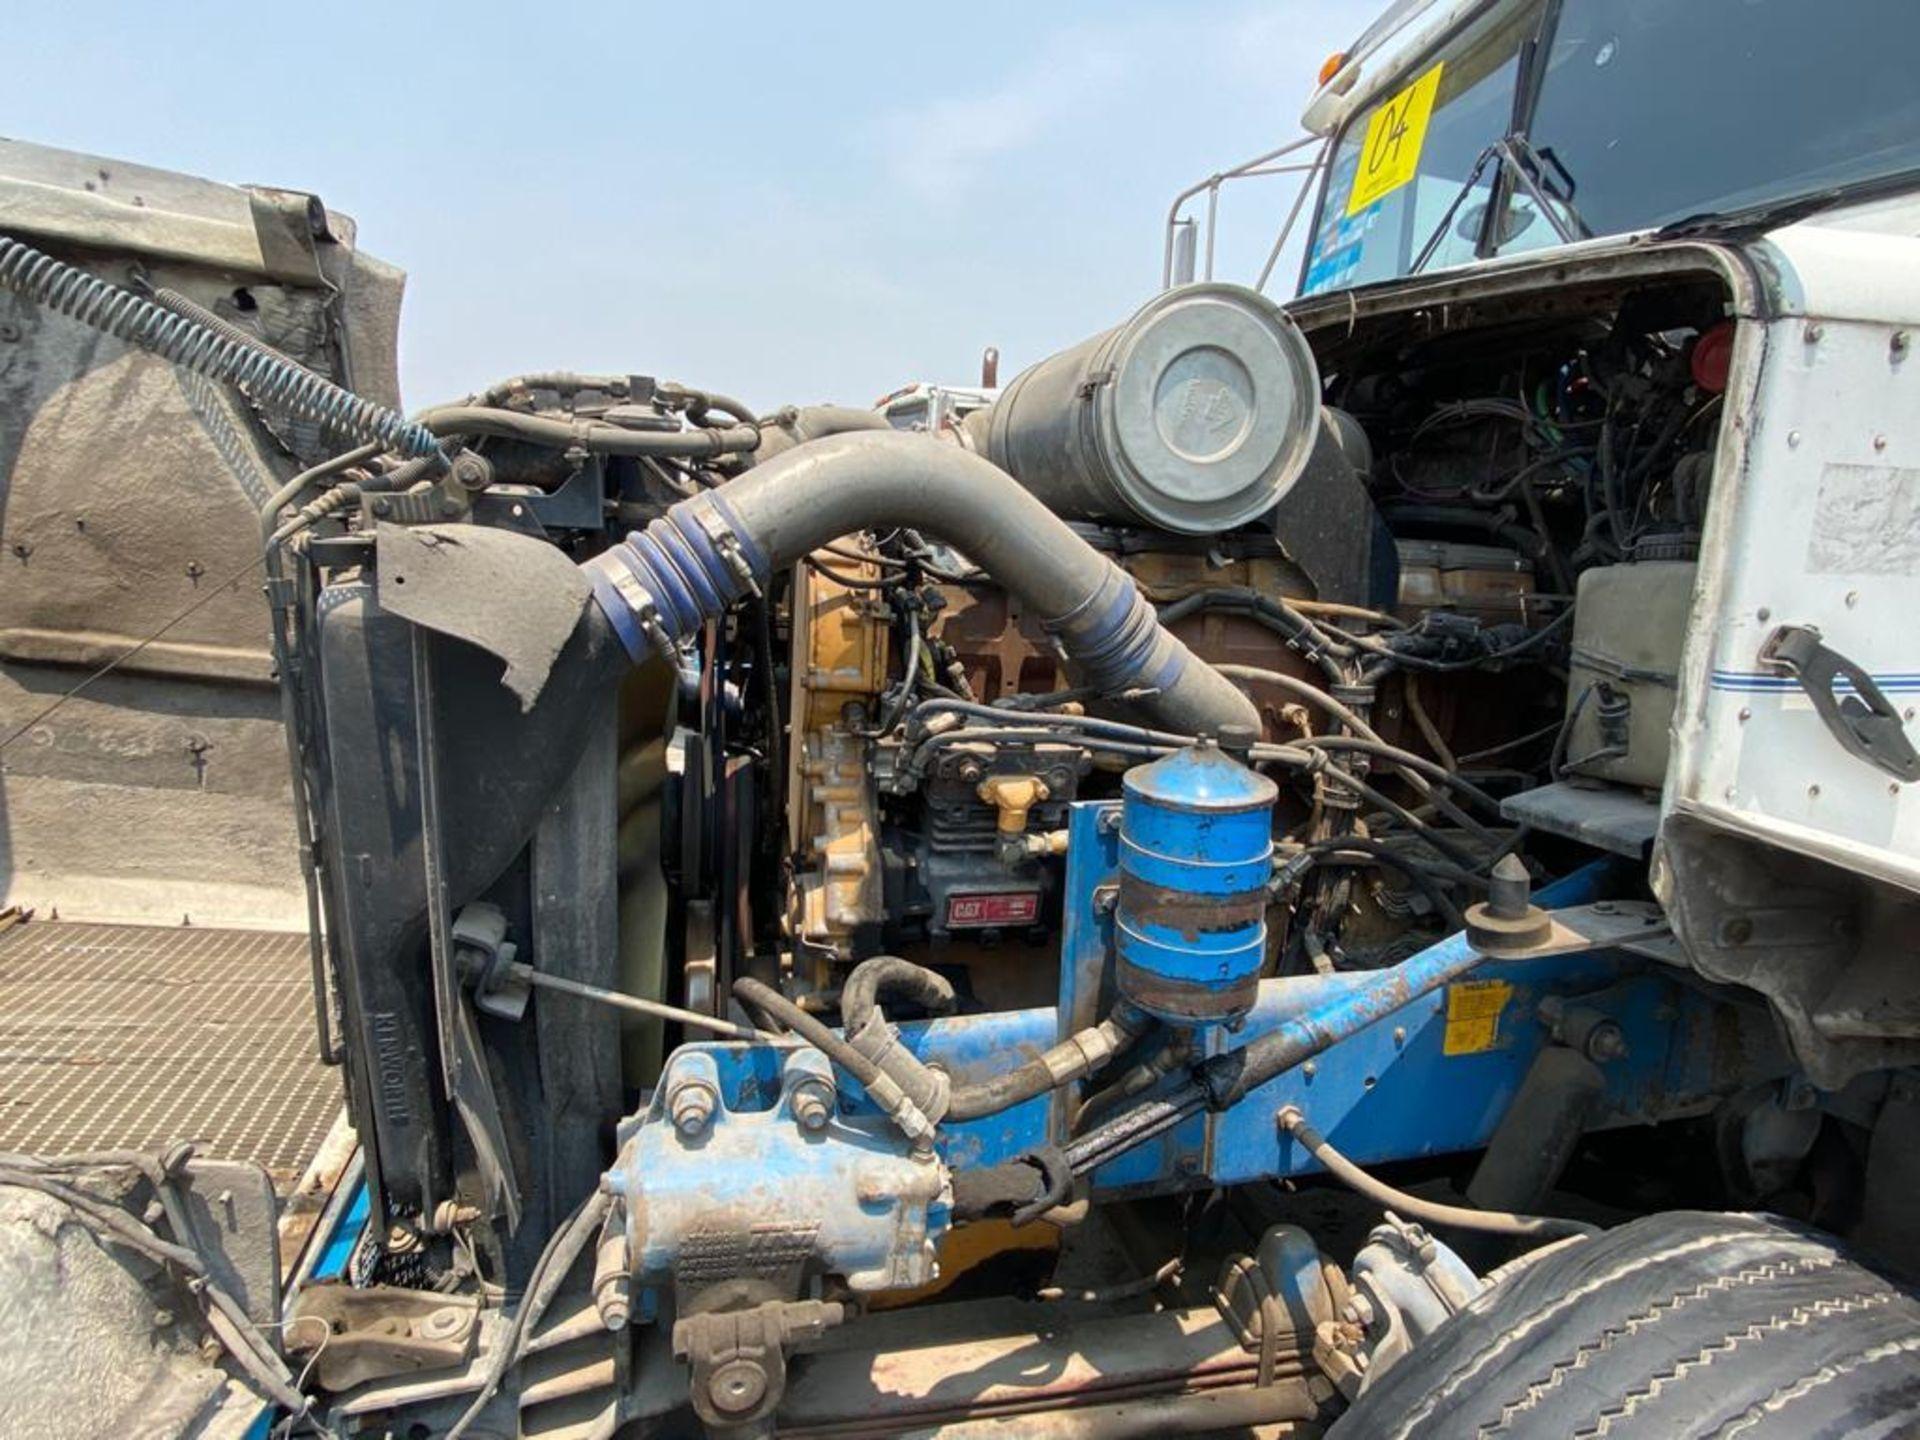 1999 Kenworth Sleeper truck tractor, standard transmission of 18 speeds - Image 56 of 70